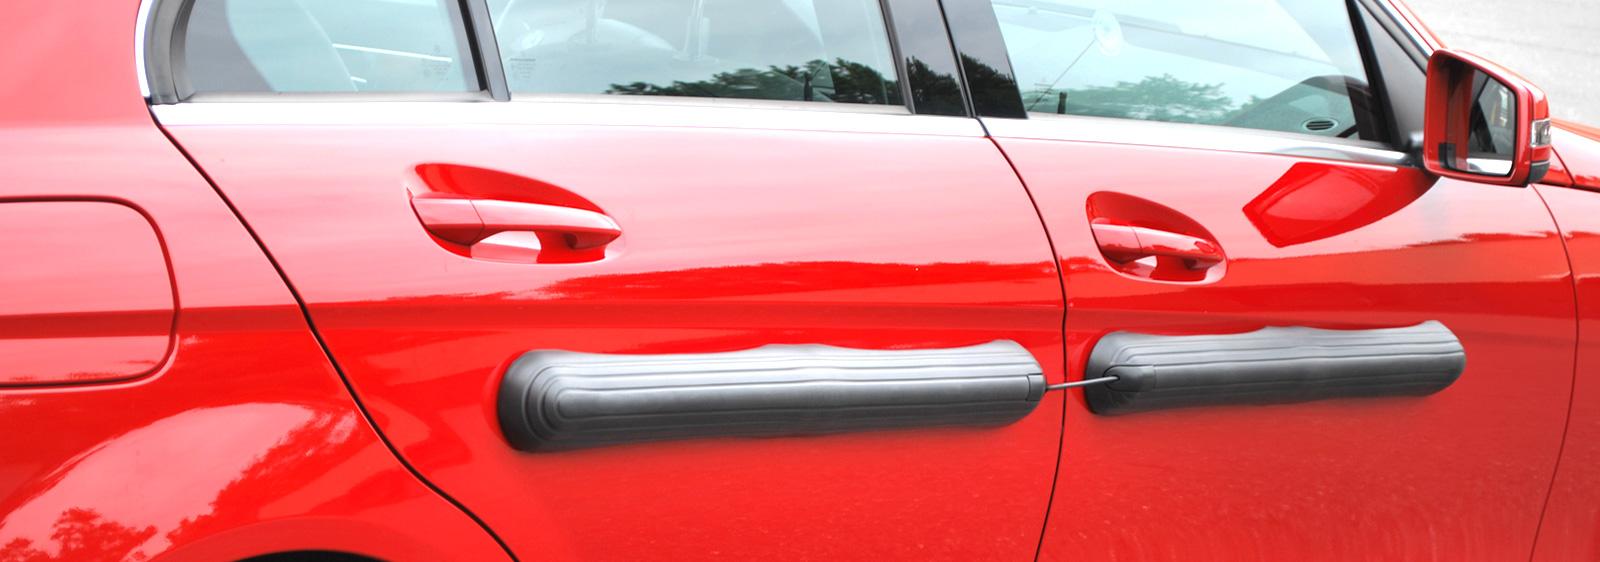 Eurobumperguard Factory Direct Bumper Protection Rear